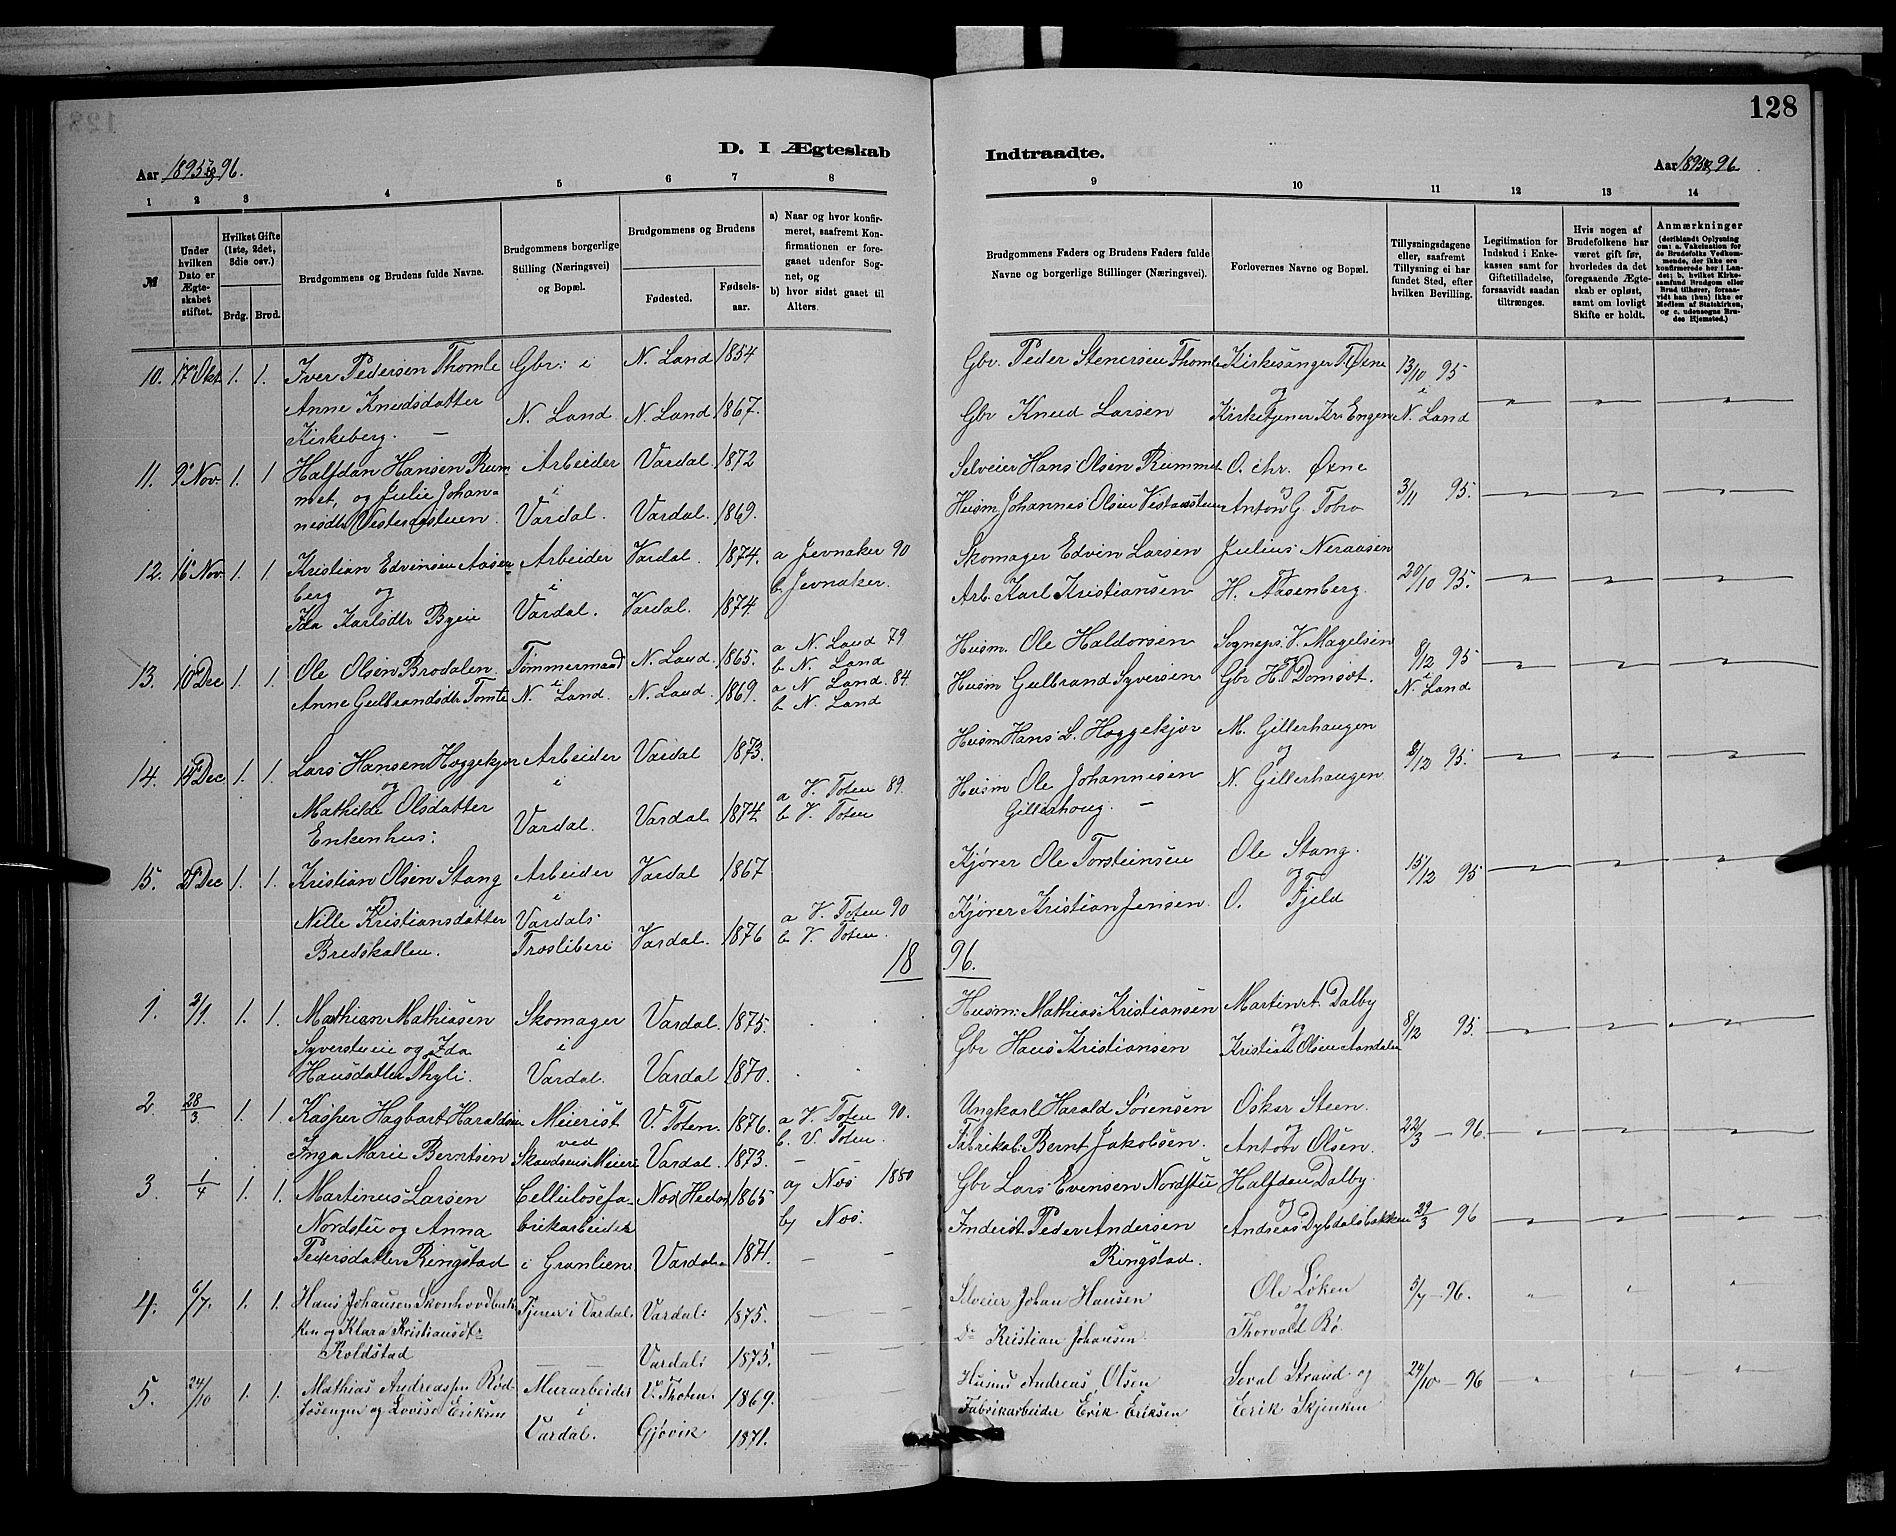 SAH, Vardal prestekontor, H/Ha/Hab/L0008: Klokkerbok nr. 8, 1881-1898, s. 128